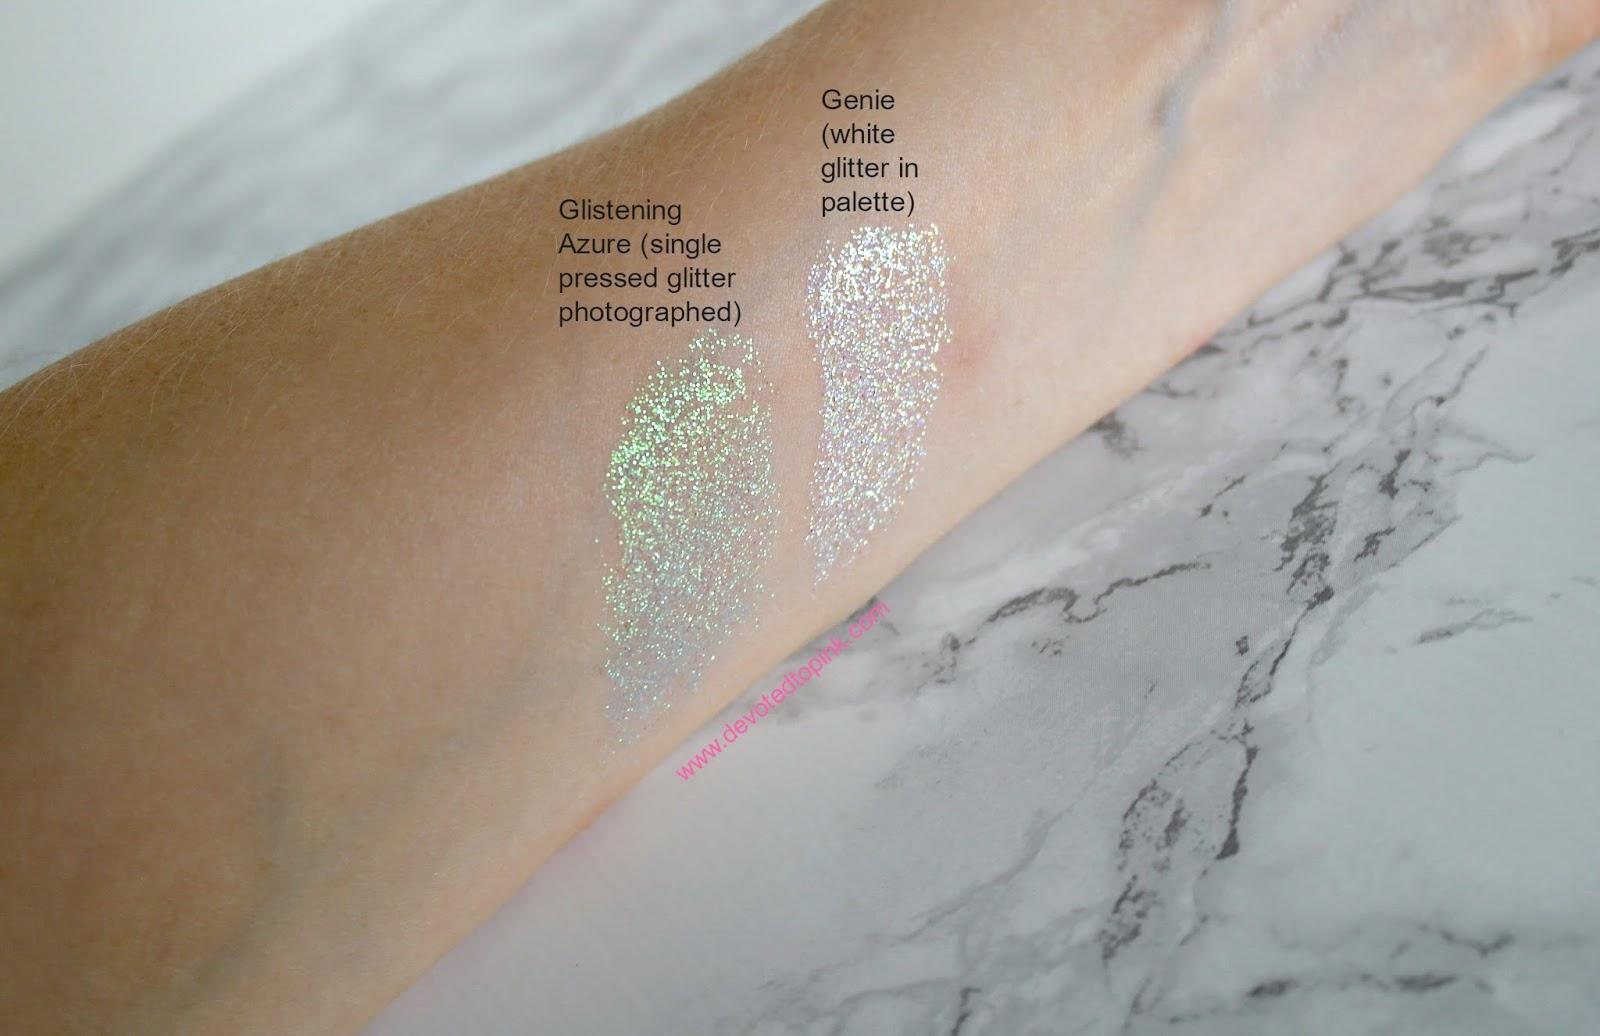 glittereyes, niji cosmetics, glitter, review, swatches, glitter eyeshadow, glitter eyes